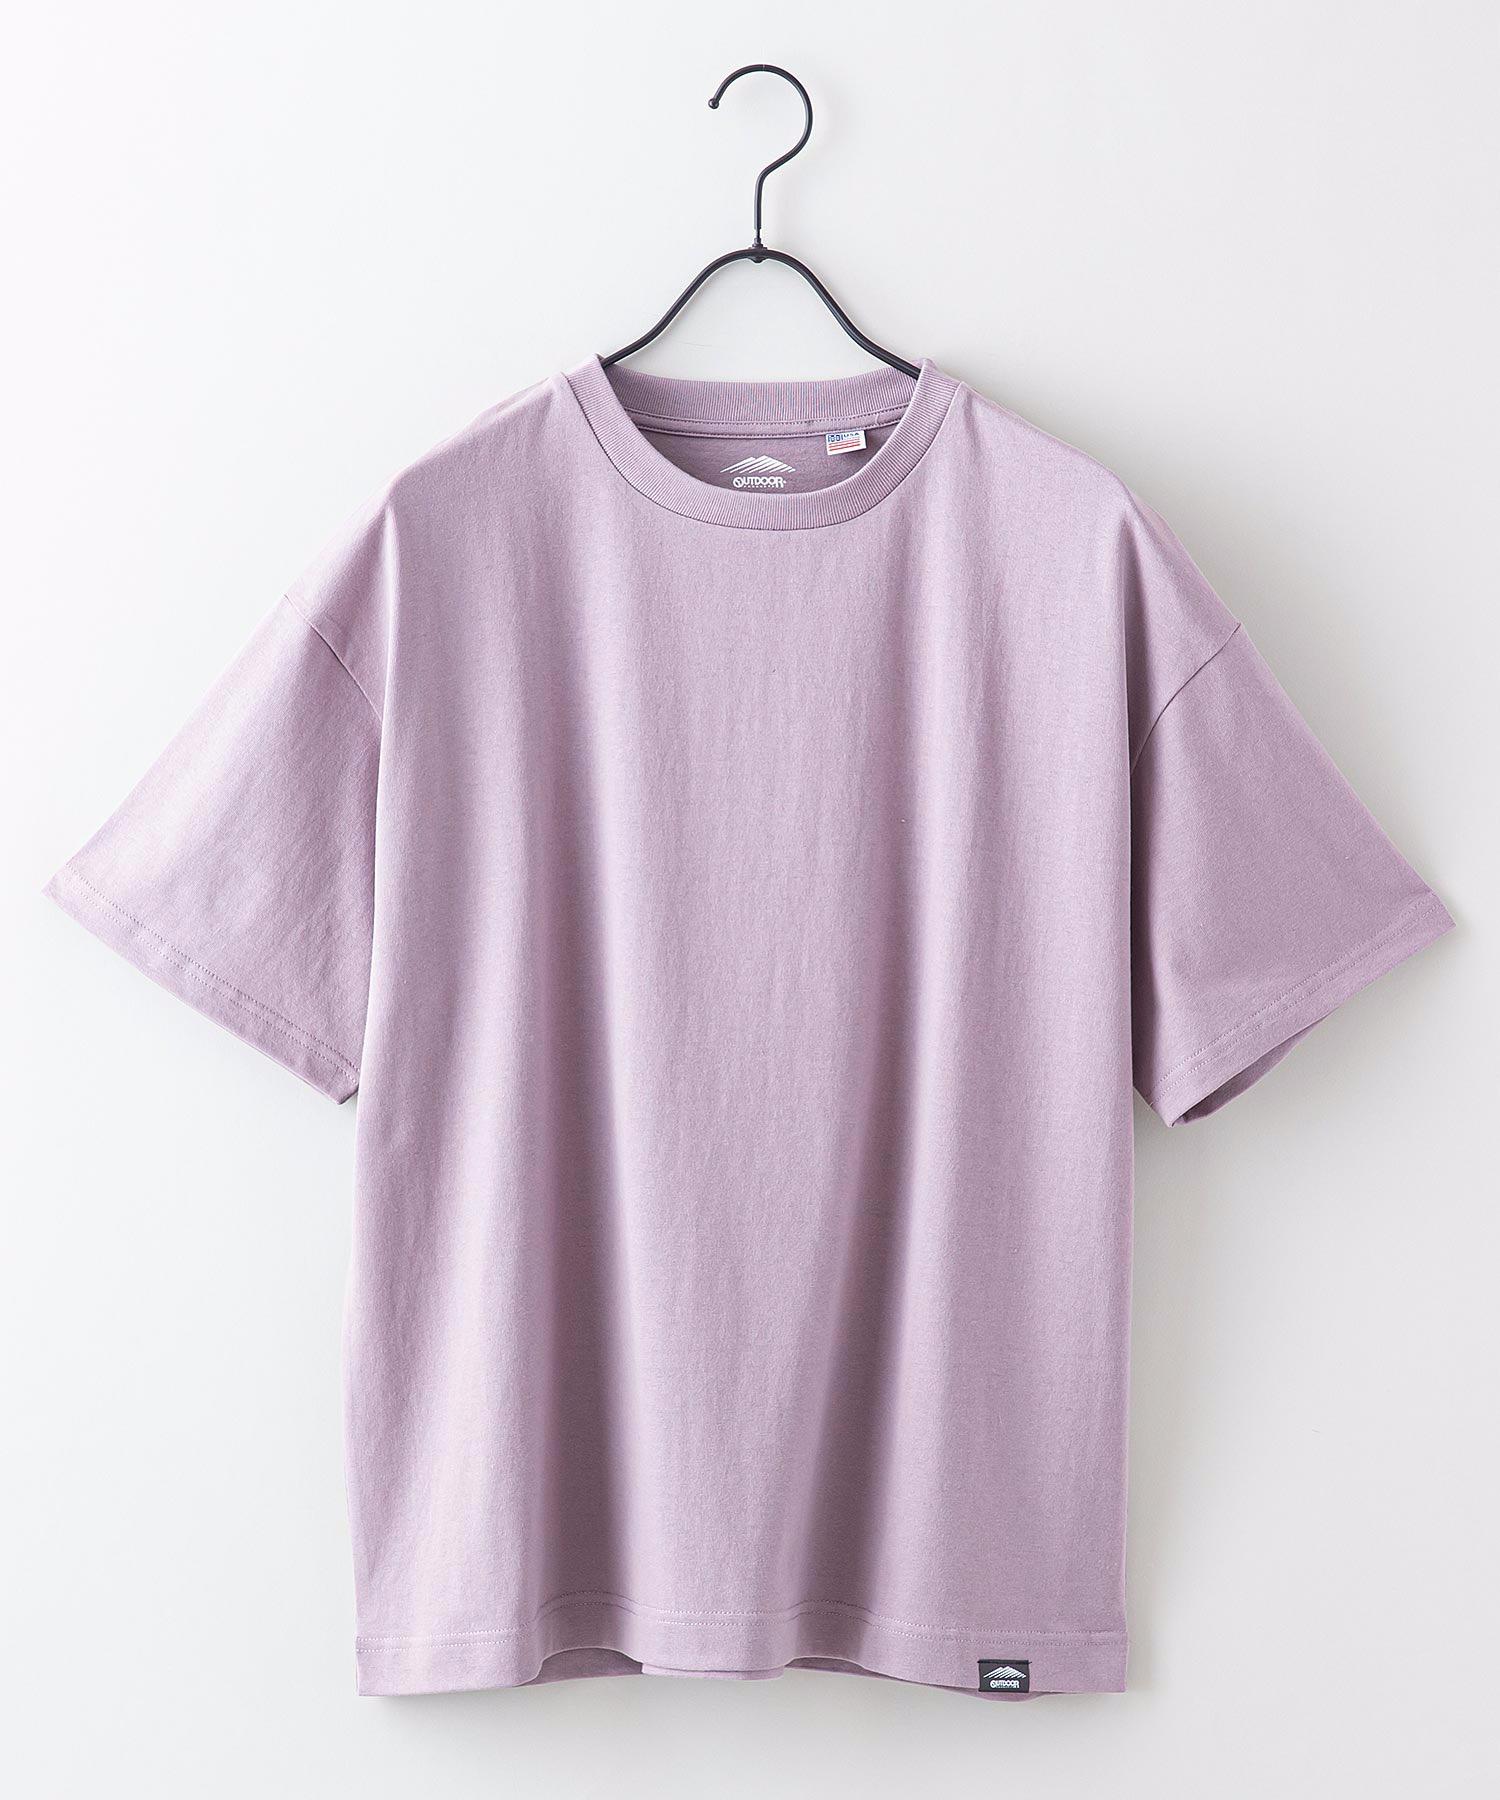 USAコットンヘビーウェイトTシャツ 5分袖 オーバーサイズ/ビッグシルエット